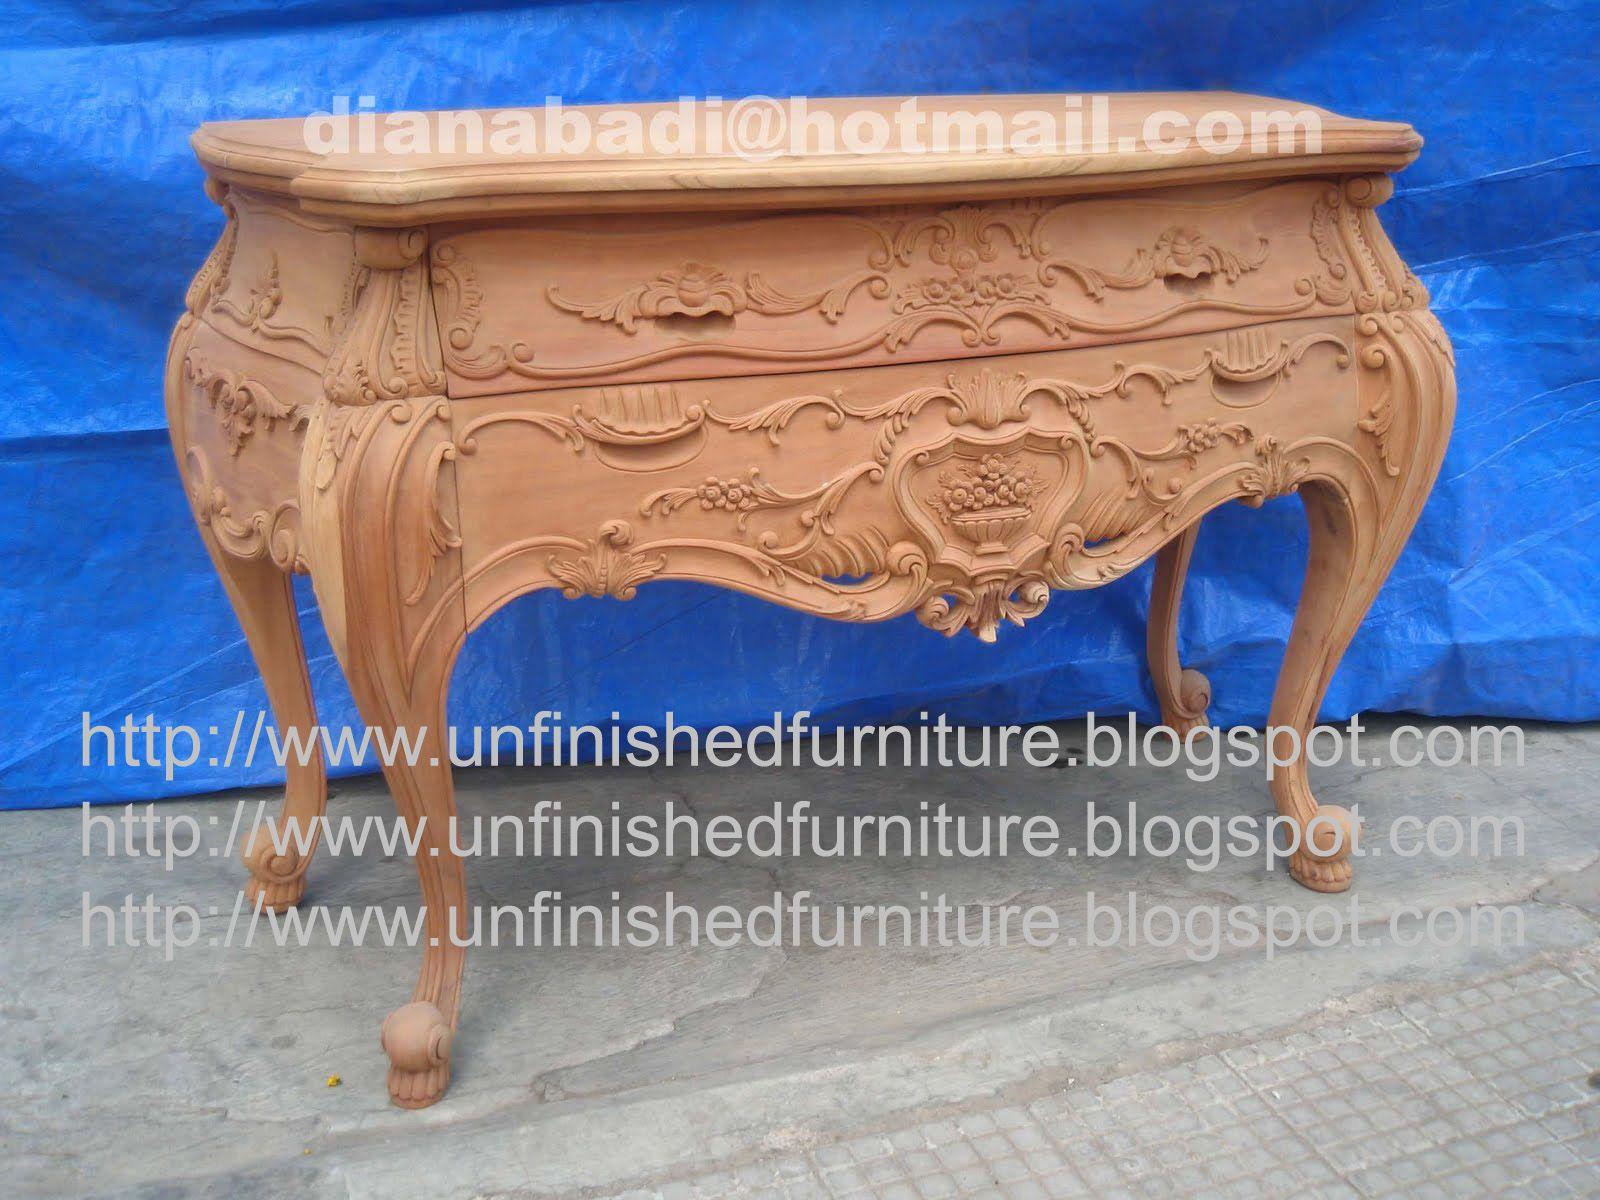 Unfinished Mahogany Furniture, Bombay Rose Carved 2 Drawer Dresser, Made Of  Fine Solid Kiln Dry Mahogany Wood. Present In Unfinished Furniture  Condition ...